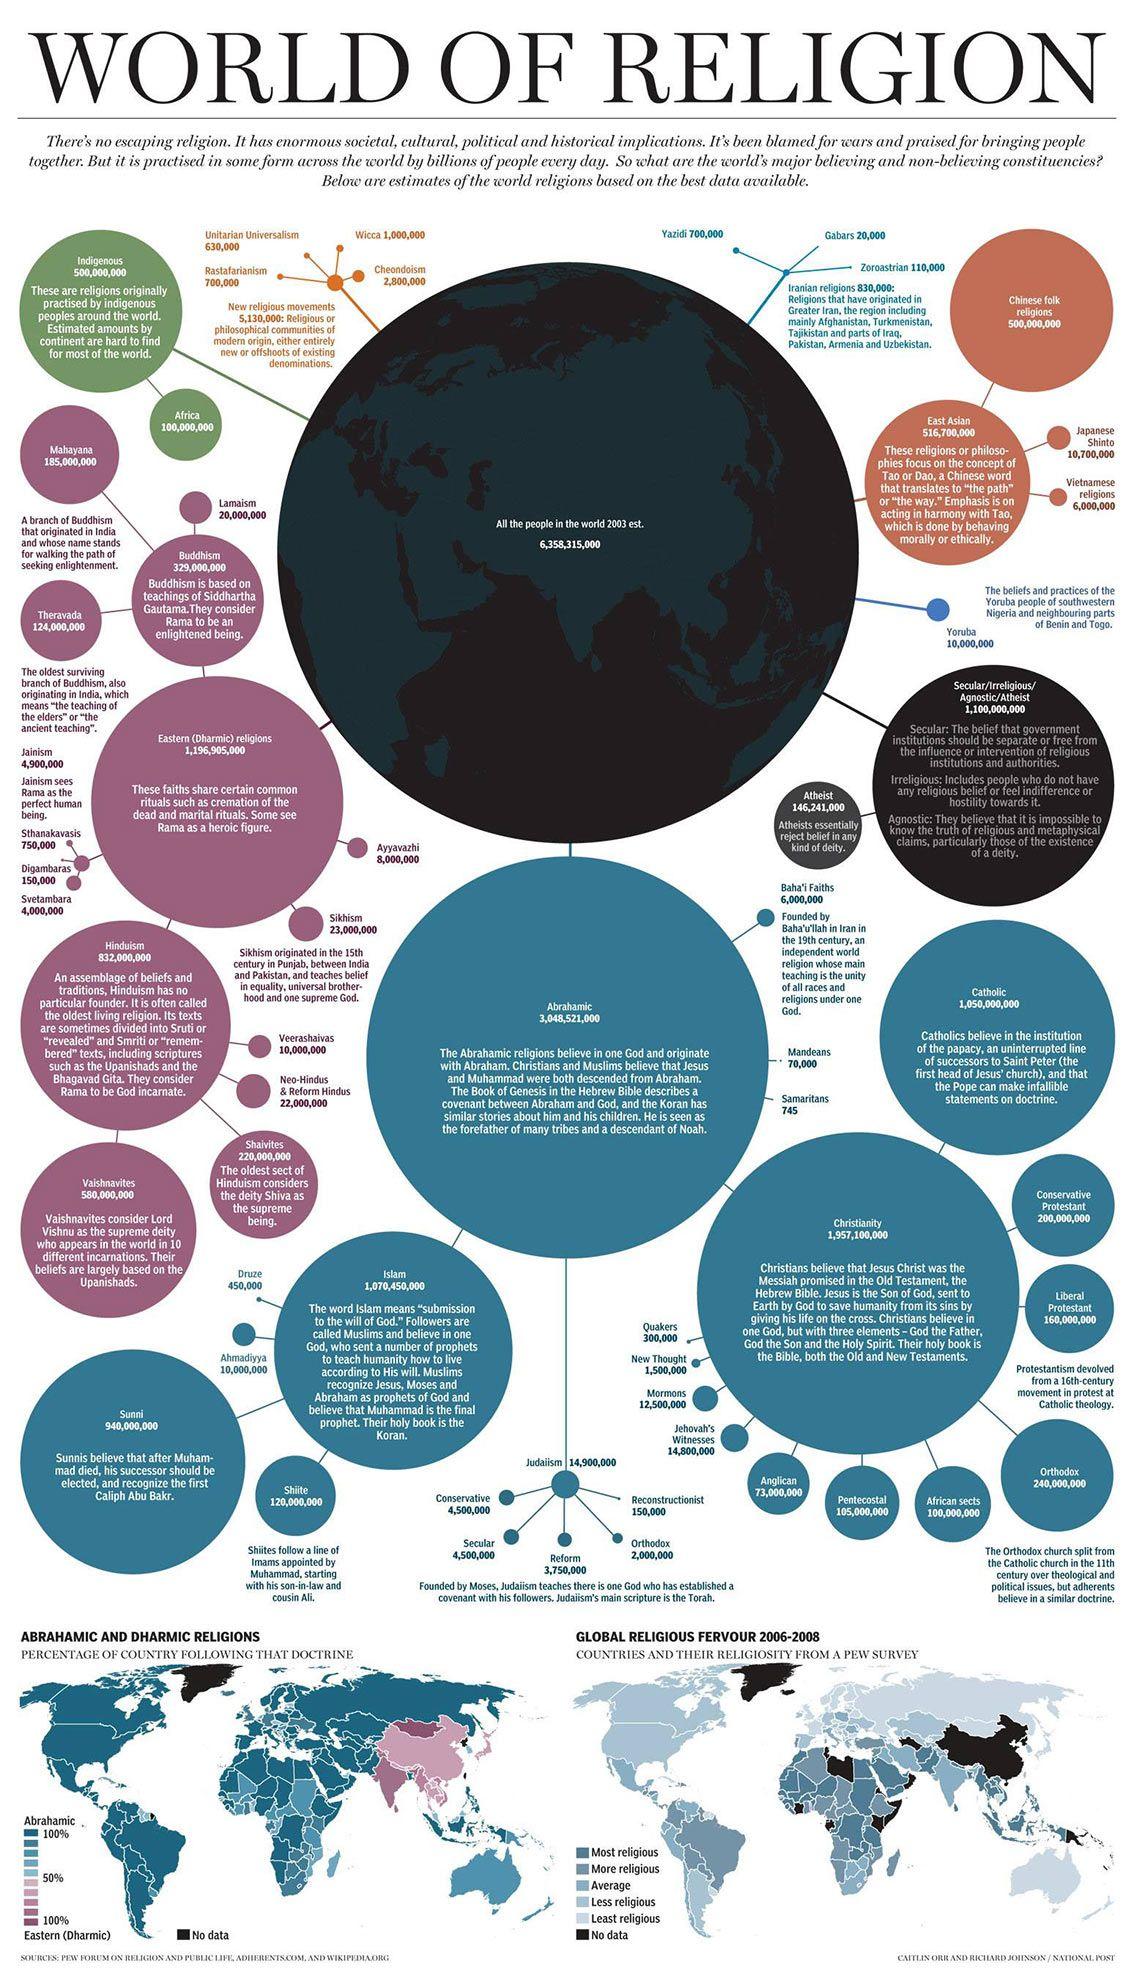 World Of Religion Most Followers Worldwide Infographic - Which religion has most followers